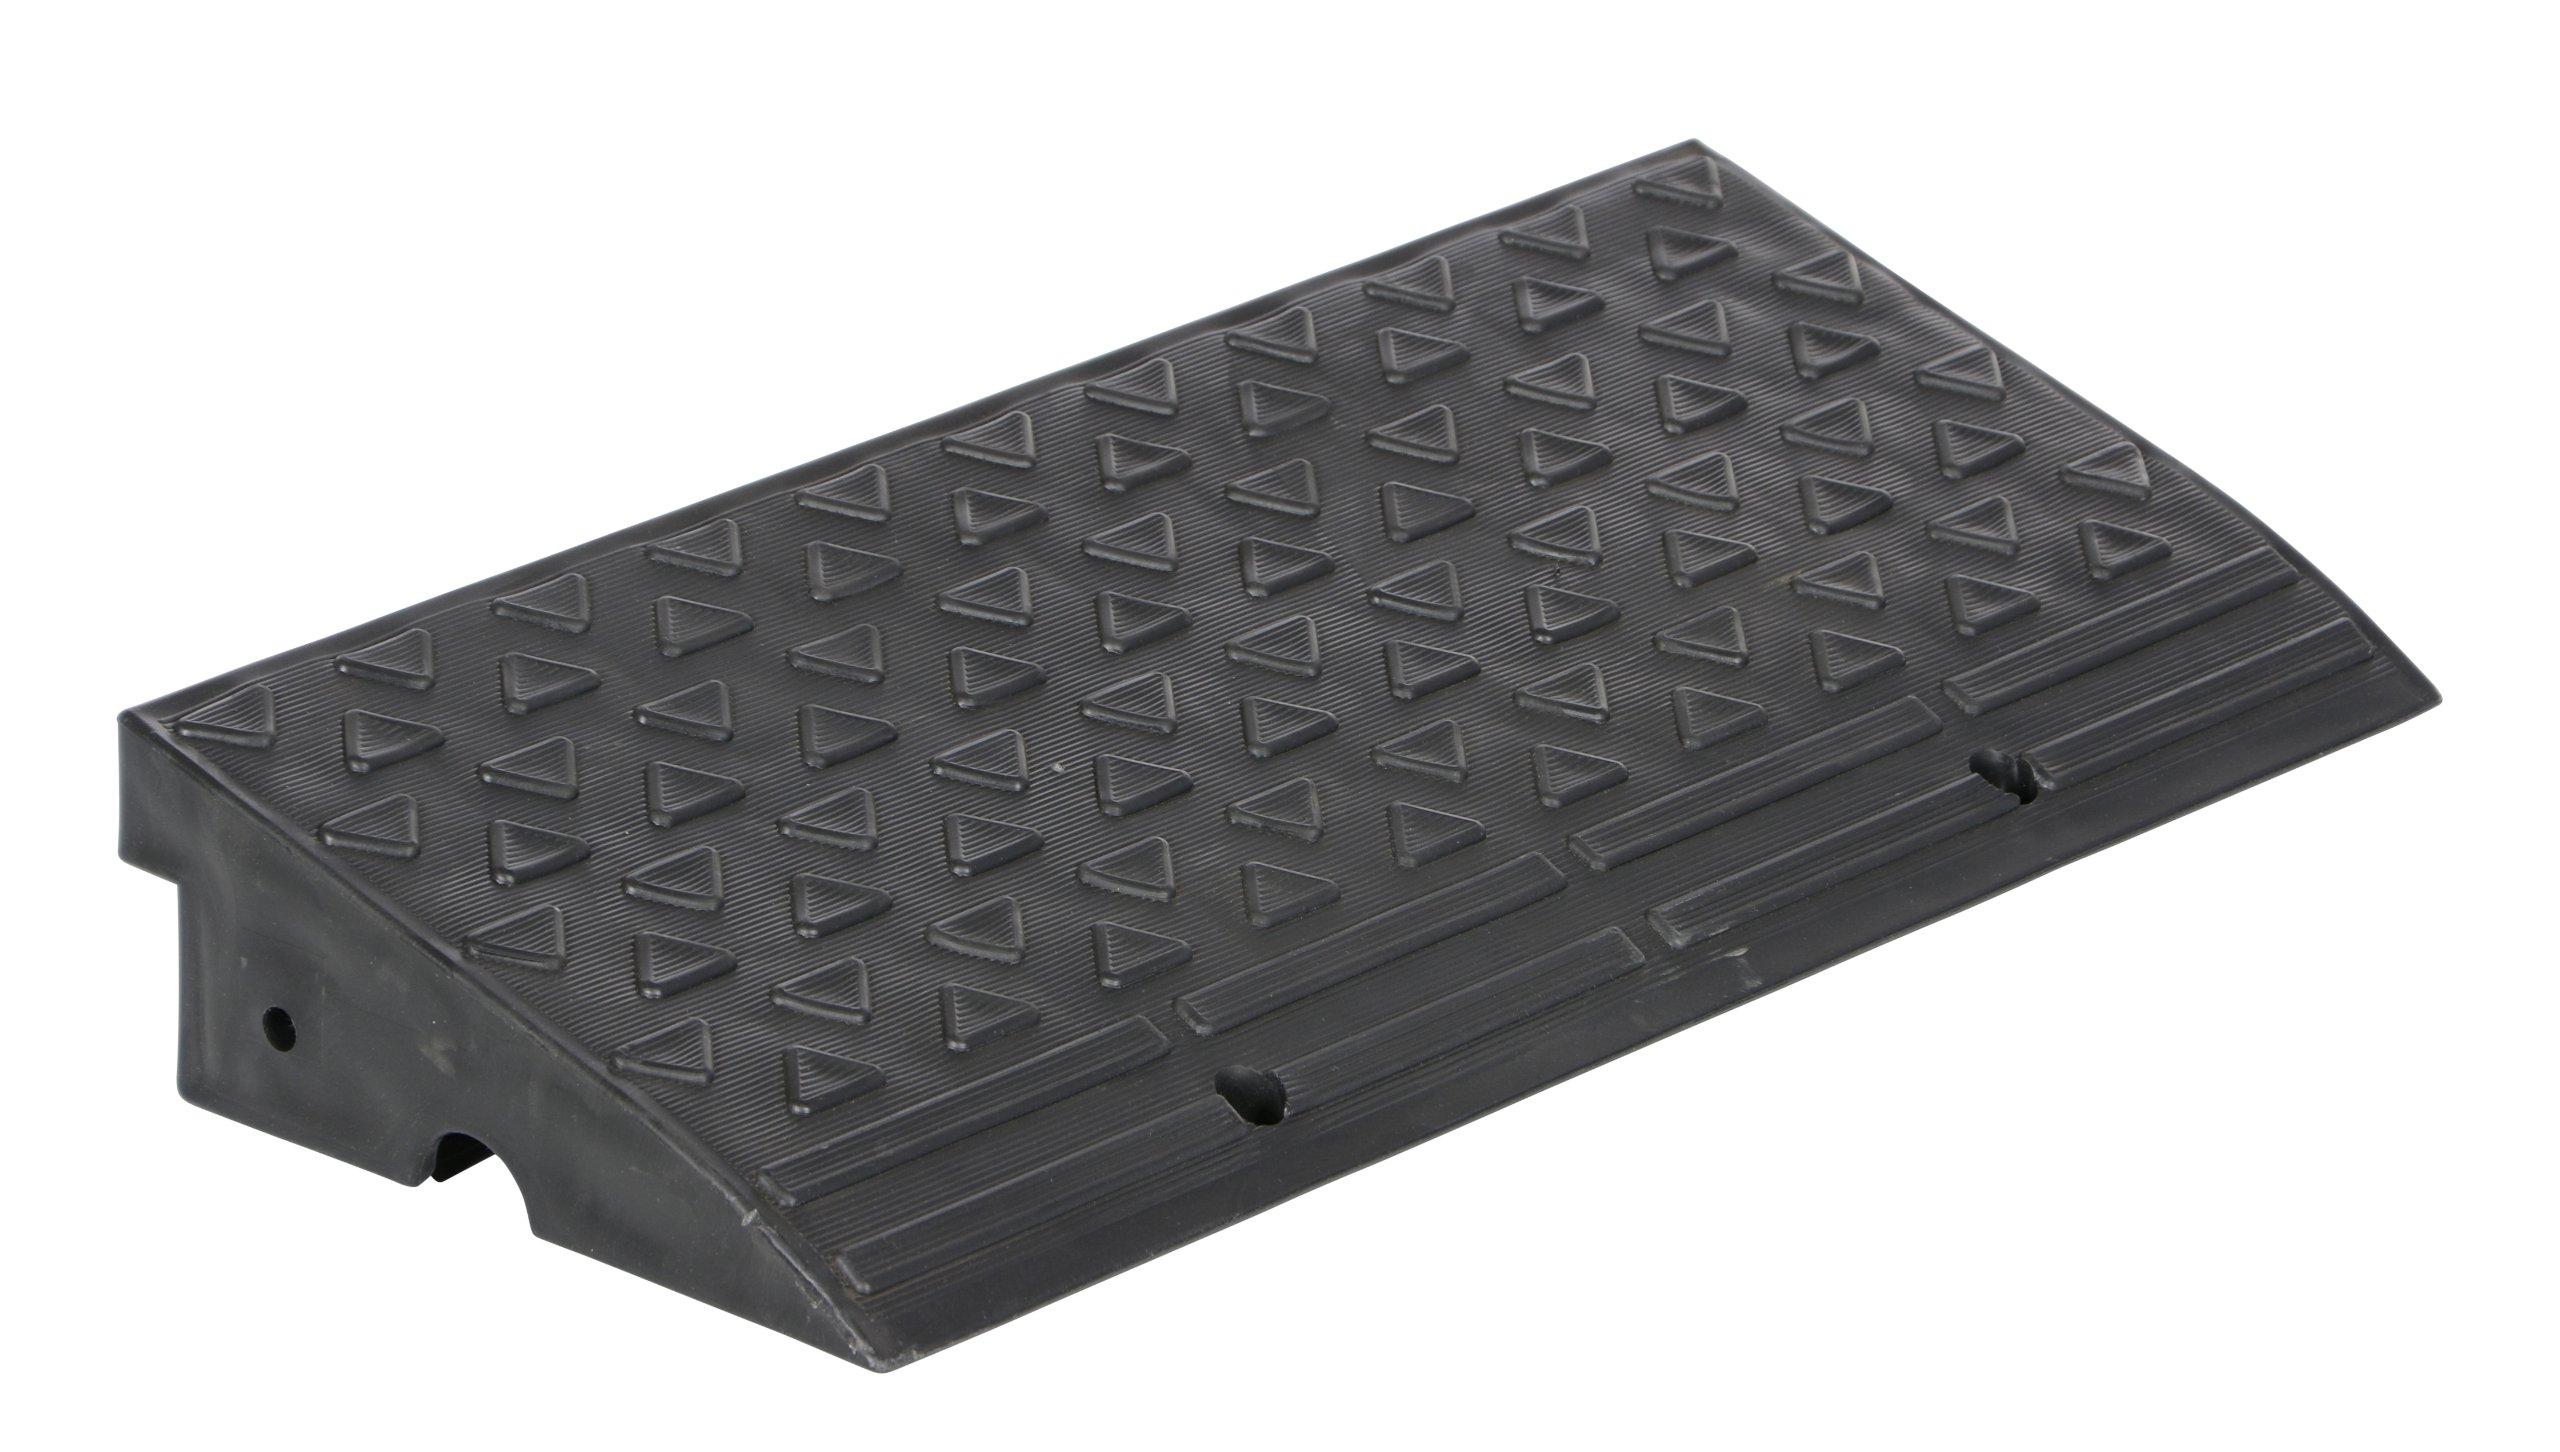 Vestil MPR-2410 Plastic Multi Purpose Ramp, 5000 lbs Capacity, 10-5/8'' Length, 23-13/16'' Width, 3-7/8'' Height